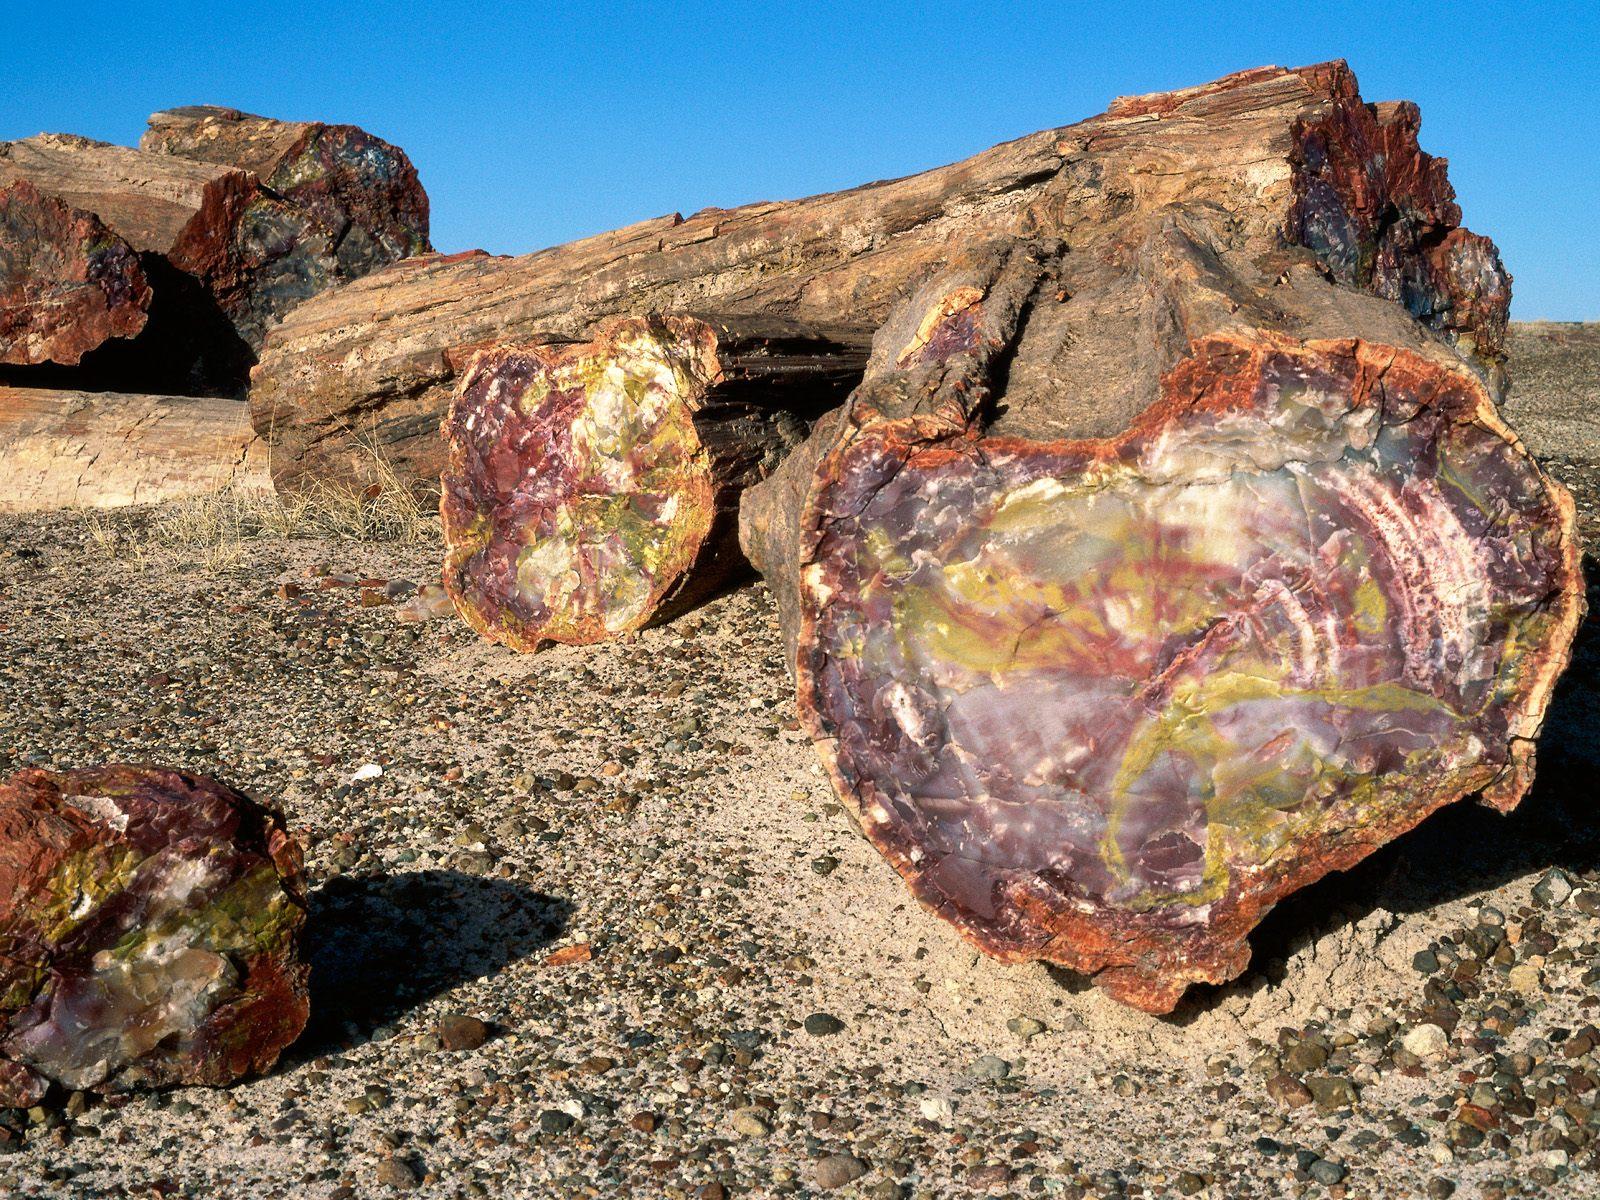 Petrified_forest_national_park,_arizona